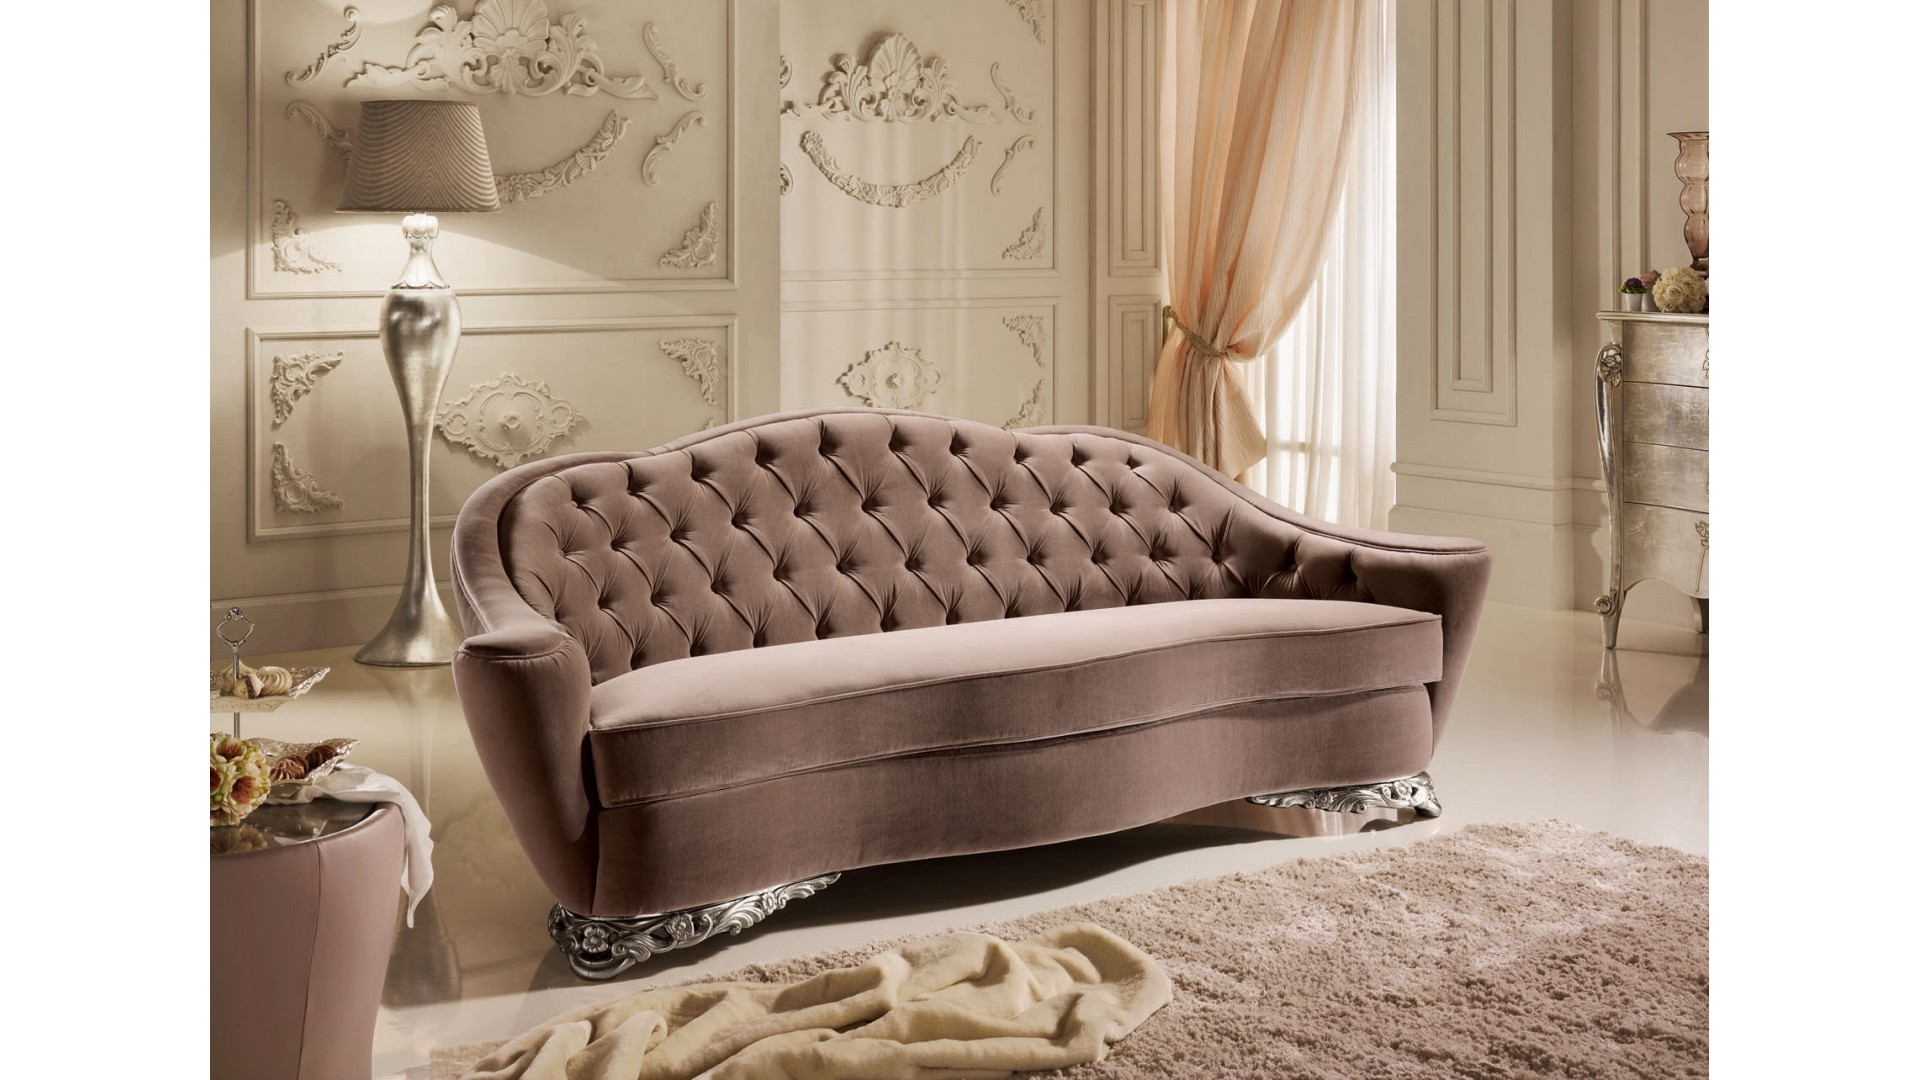 canap butterfly design unique en velour taupe piermaria so nuit. Black Bedroom Furniture Sets. Home Design Ideas